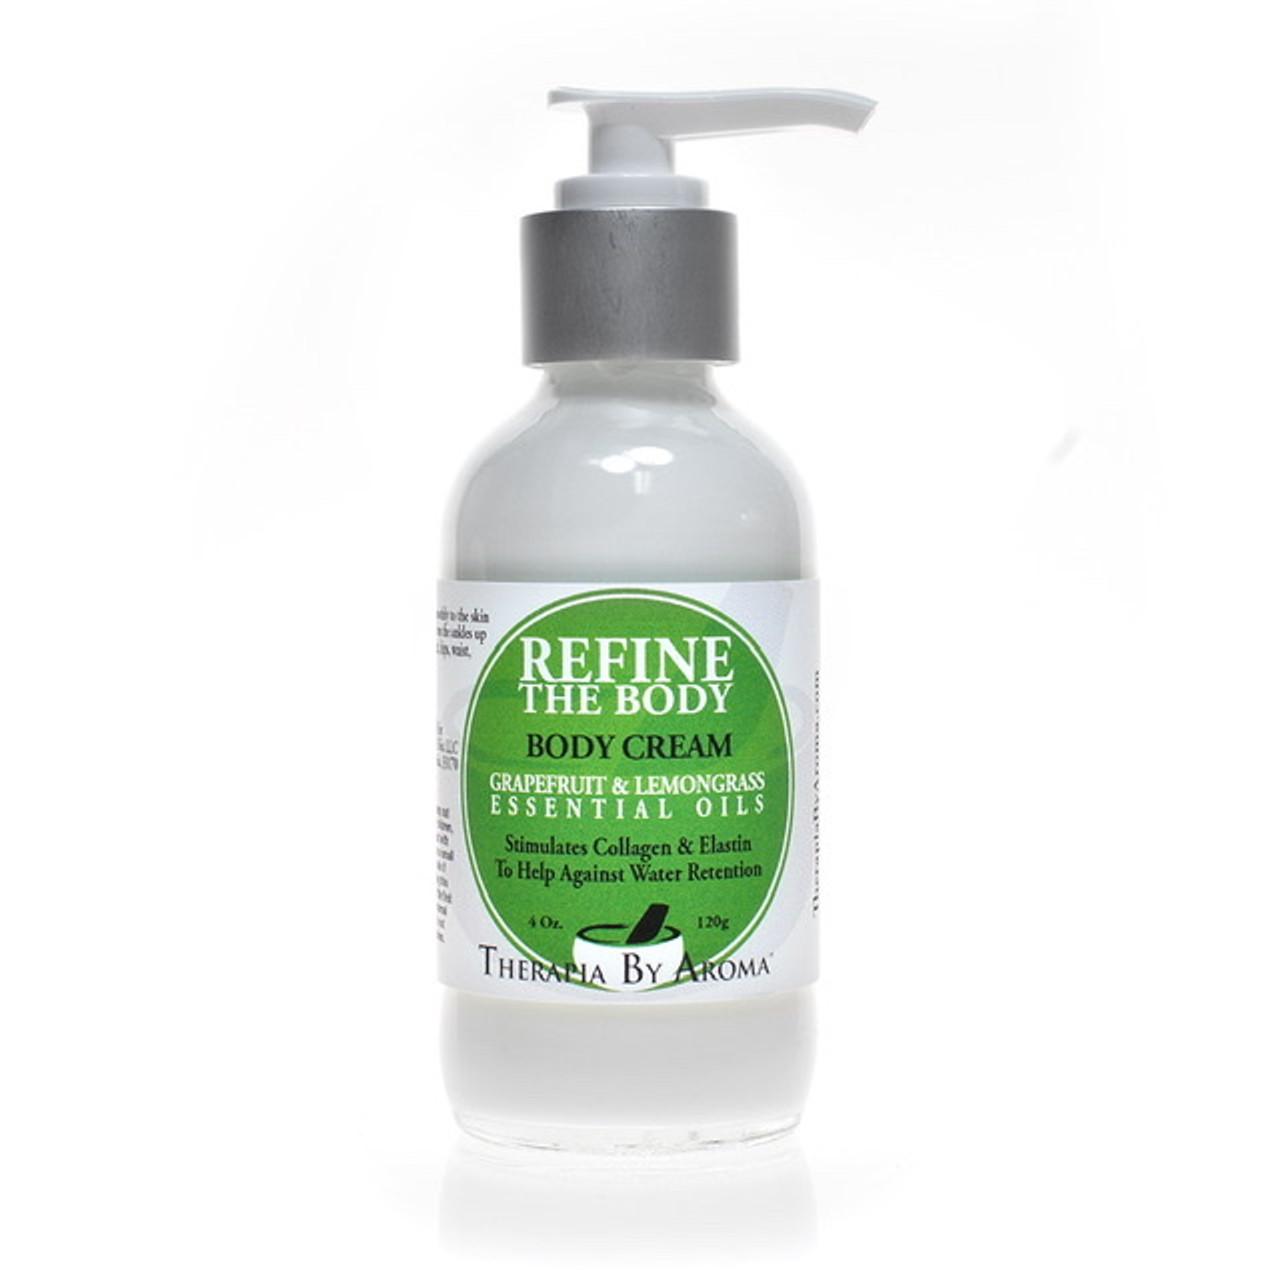 Refine Body Water Retention Body Cream With Lemongrass Grapefruit Essential Oils Therapia By Aroma